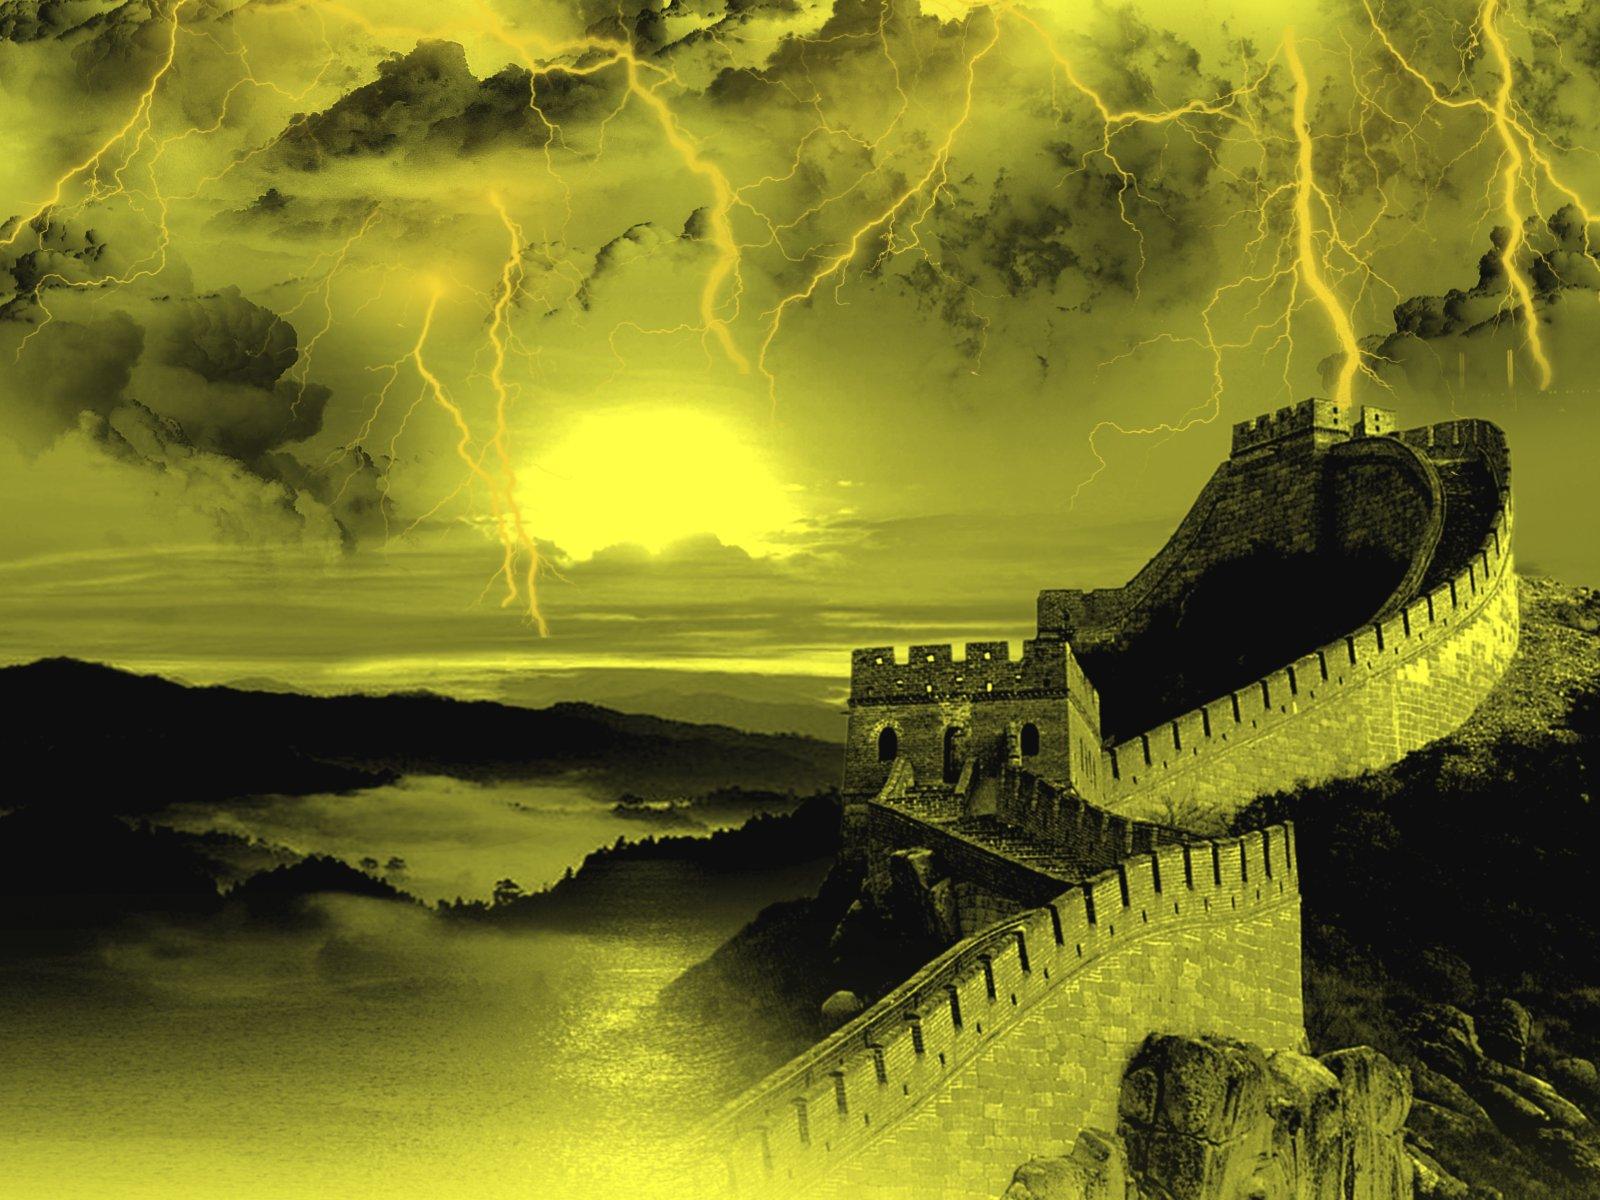 Blue Sky 3d Wallpaper 367 Lightning Hd Wallpapers Background Images